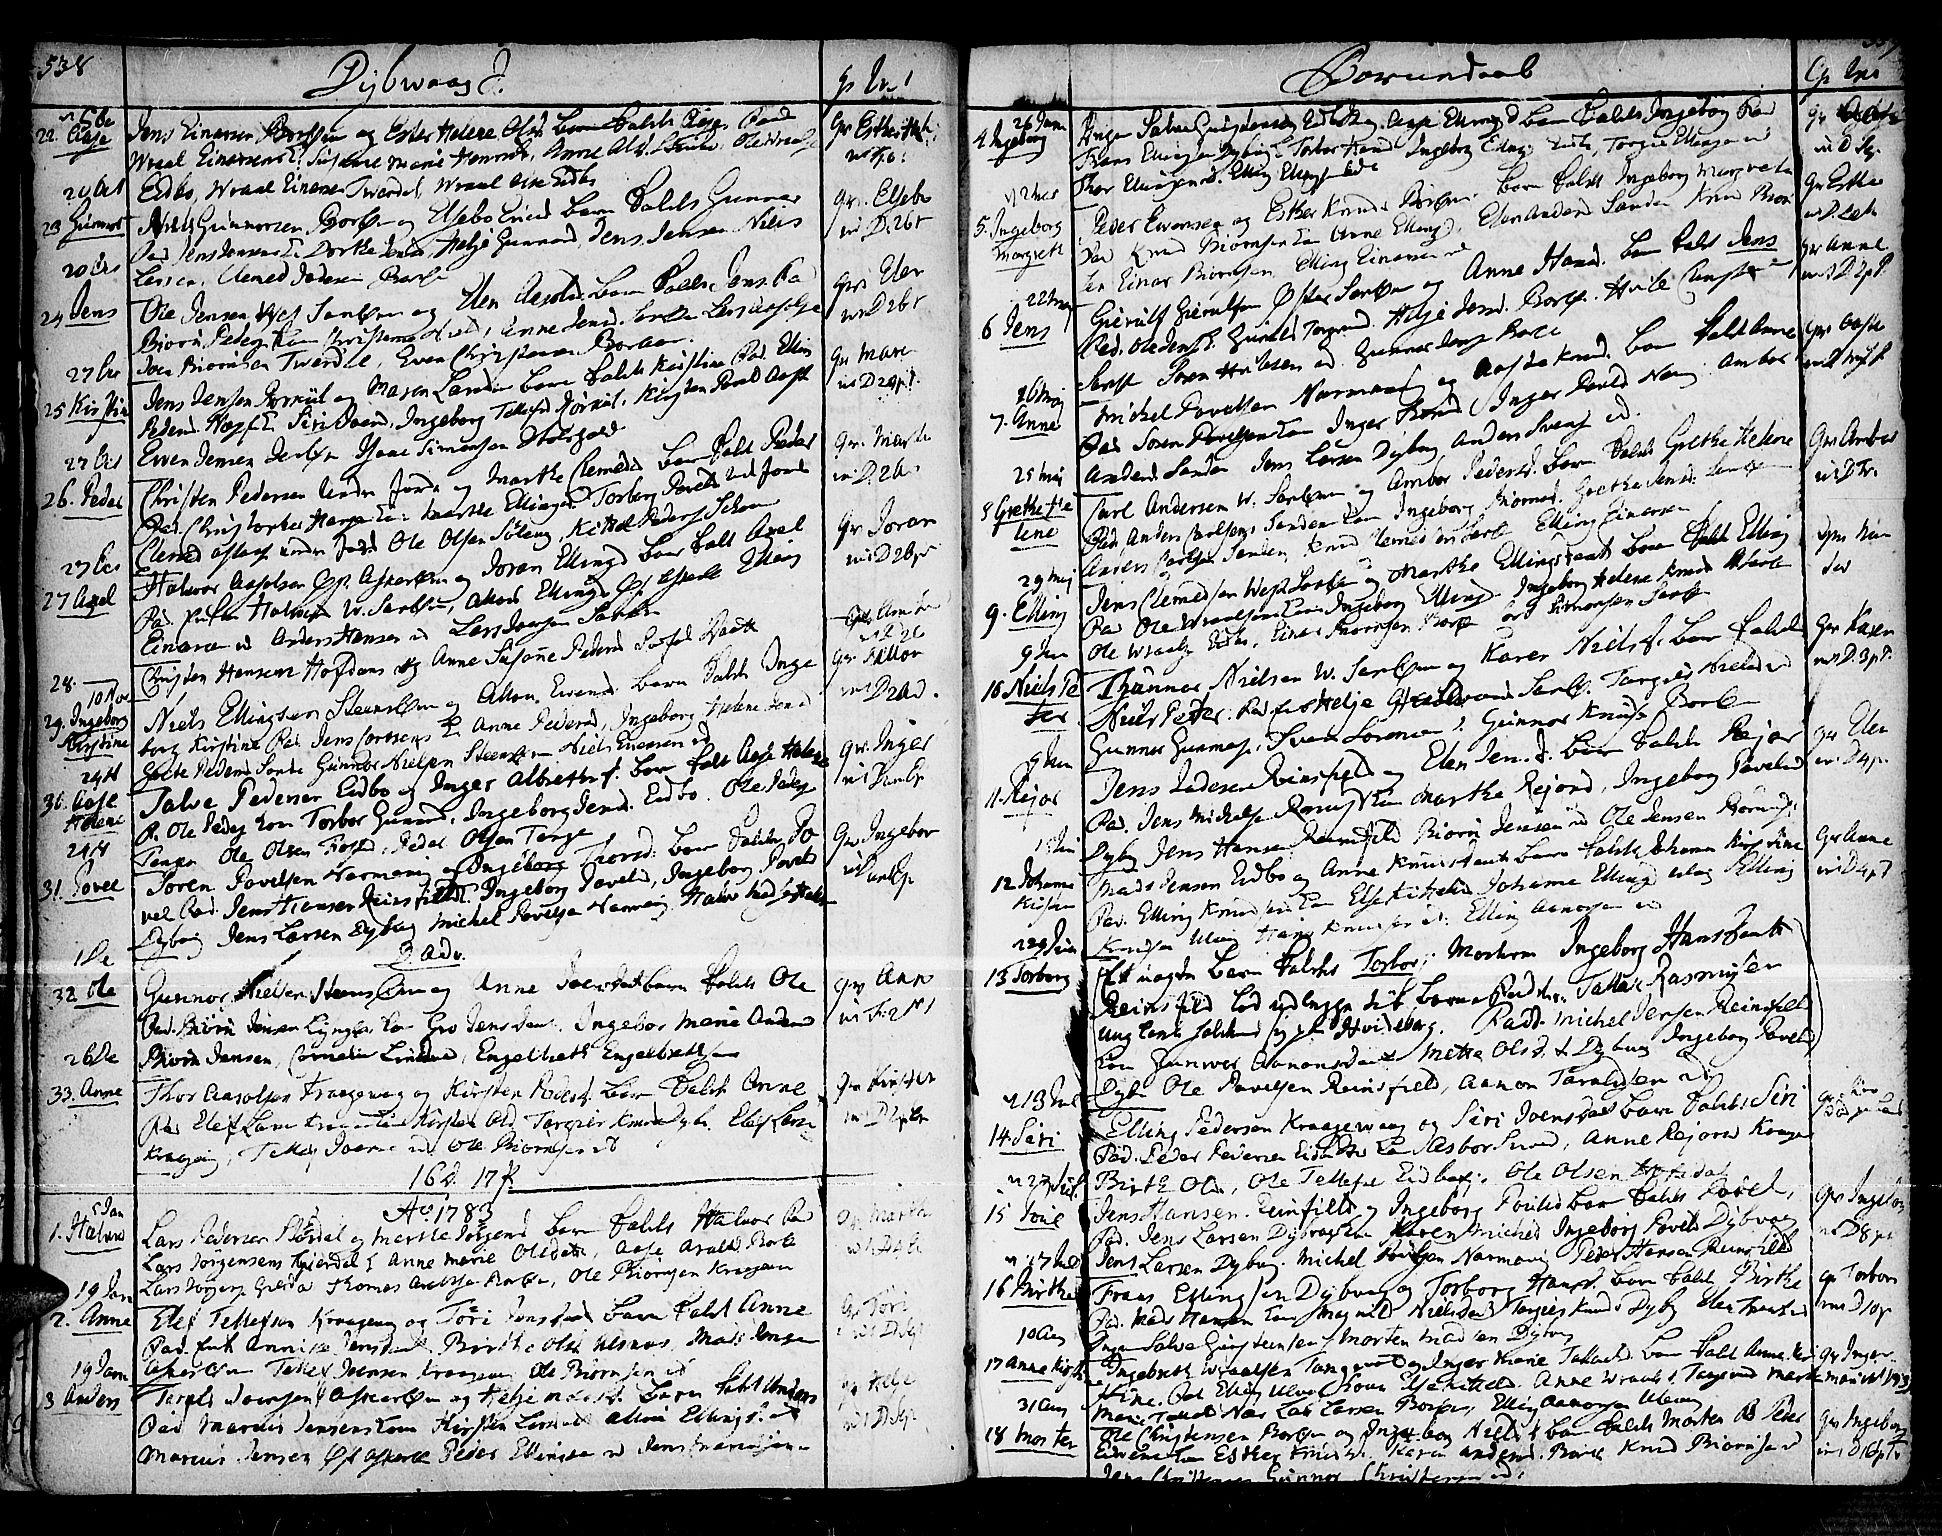 SAK, Dypvåg sokneprestkontor, F/Fa/Faa/L0001: Ministerialbok nr. A 1 /1, 1765-1798, s. 538-539